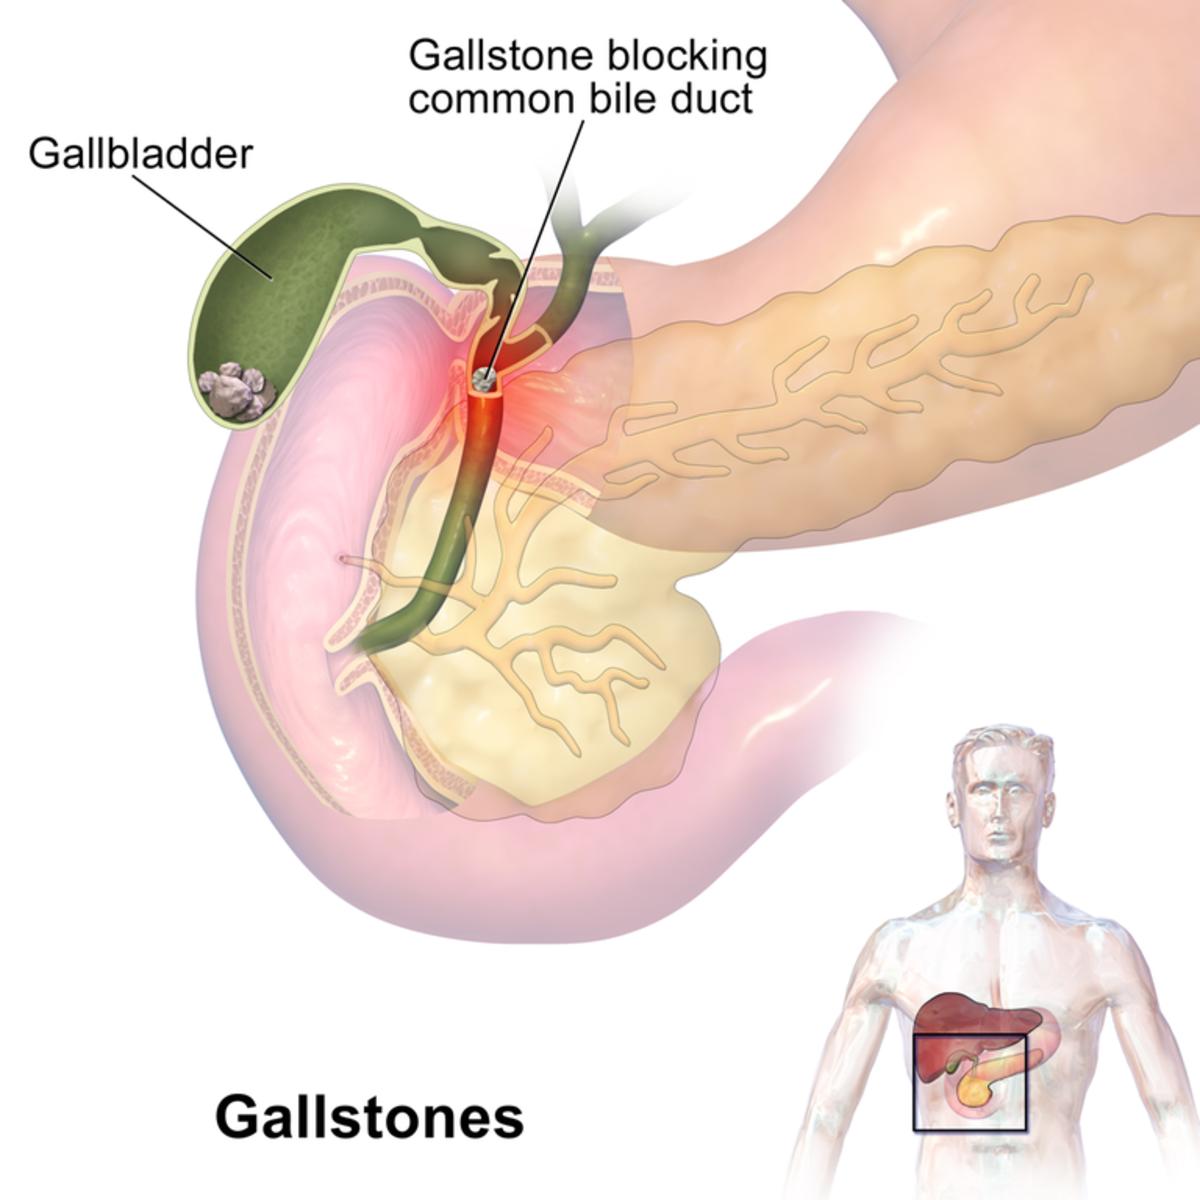 Location of gallstones